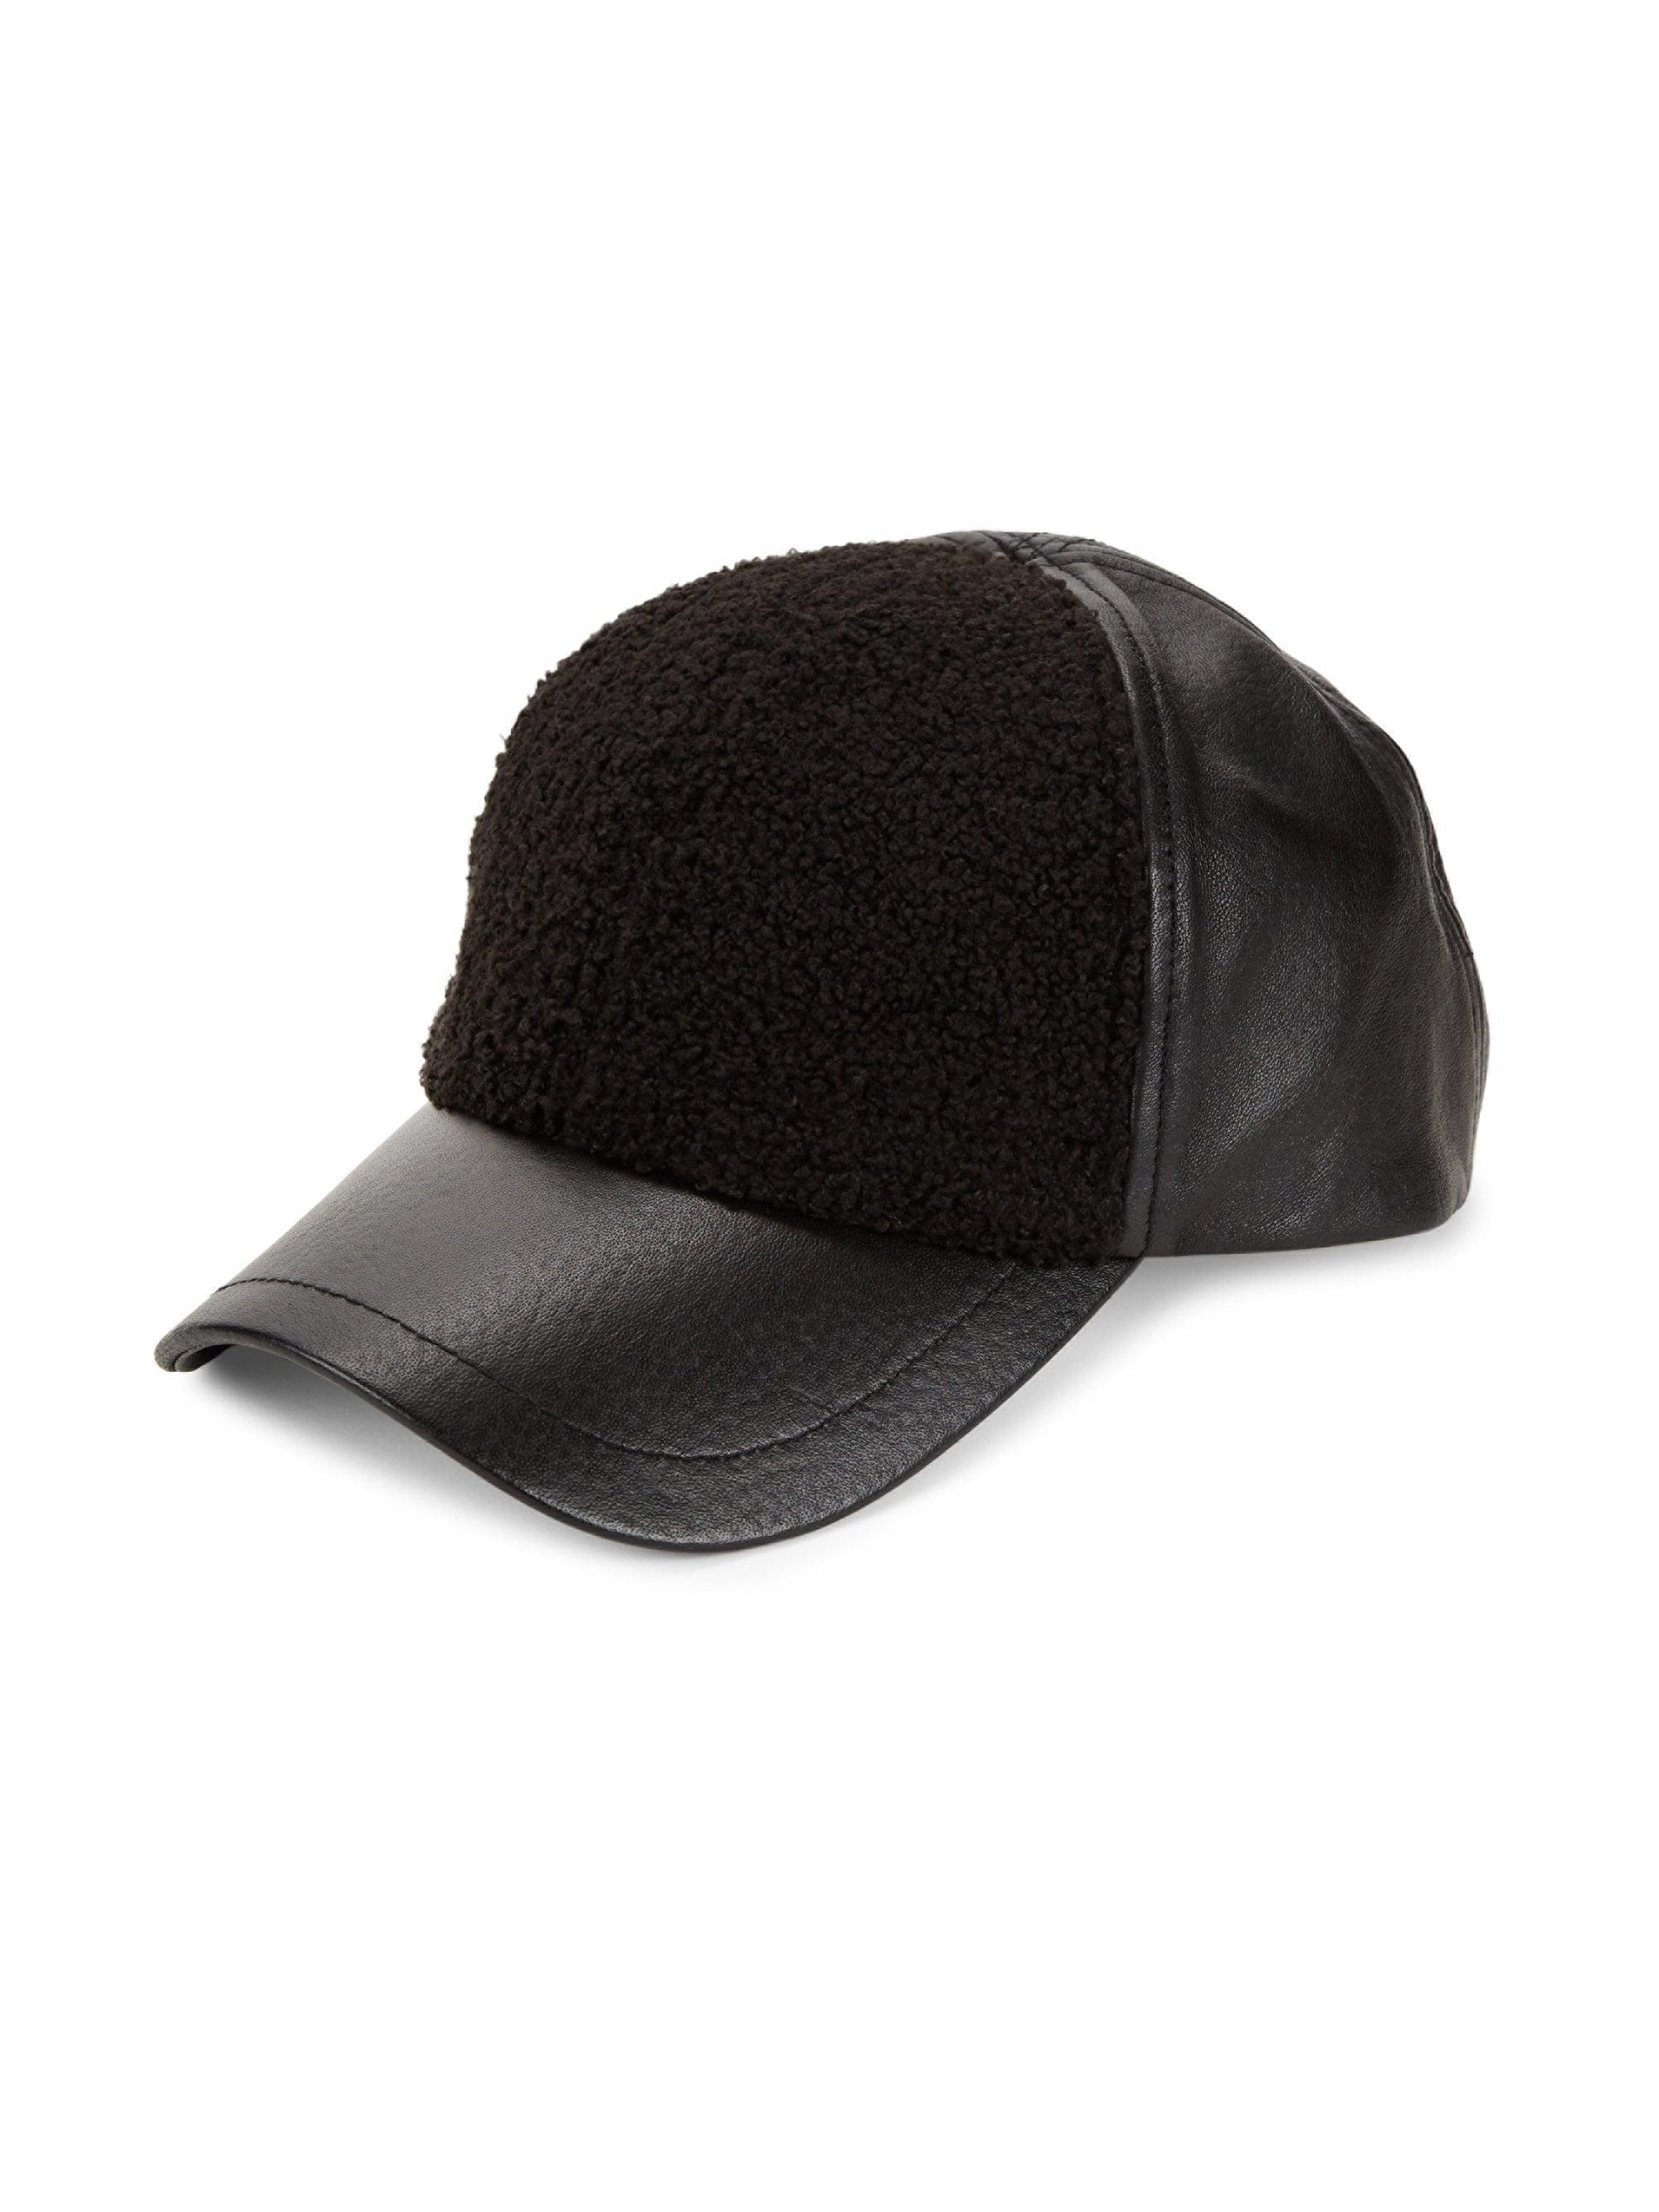 UGG Men s Faux Sherpa   Leather Baseball Cap - Black in Black for ... 3234f0f04996